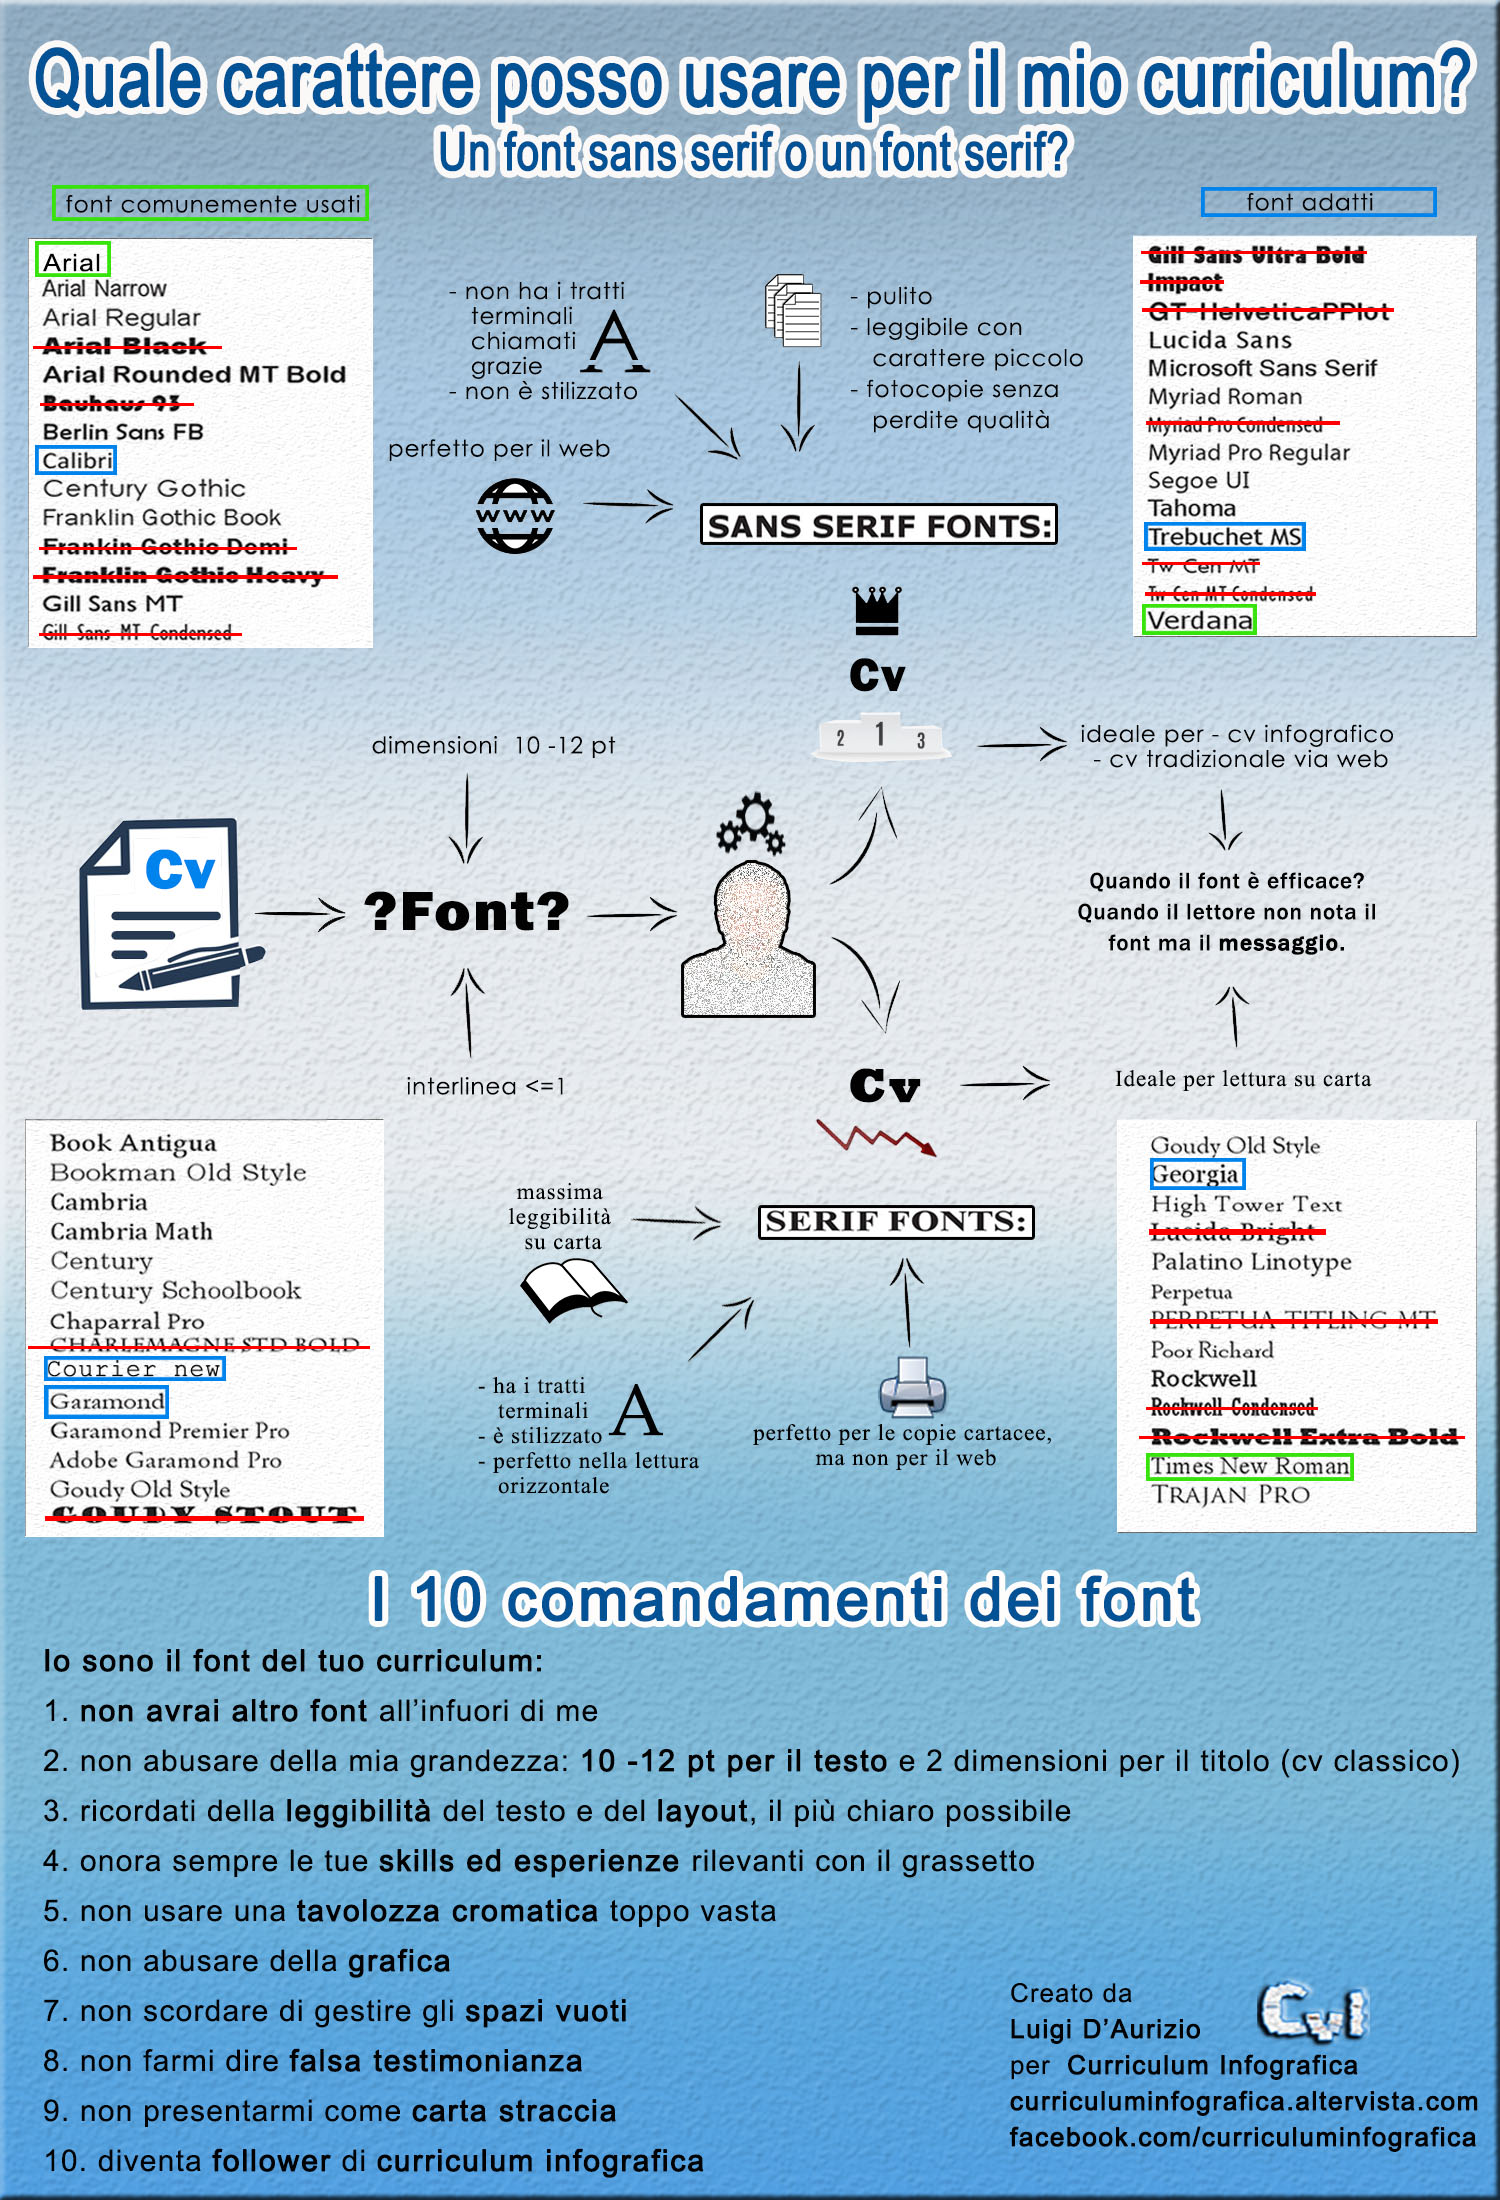 Quale Font Usare Per Il Curriculum L Infografica Risponde